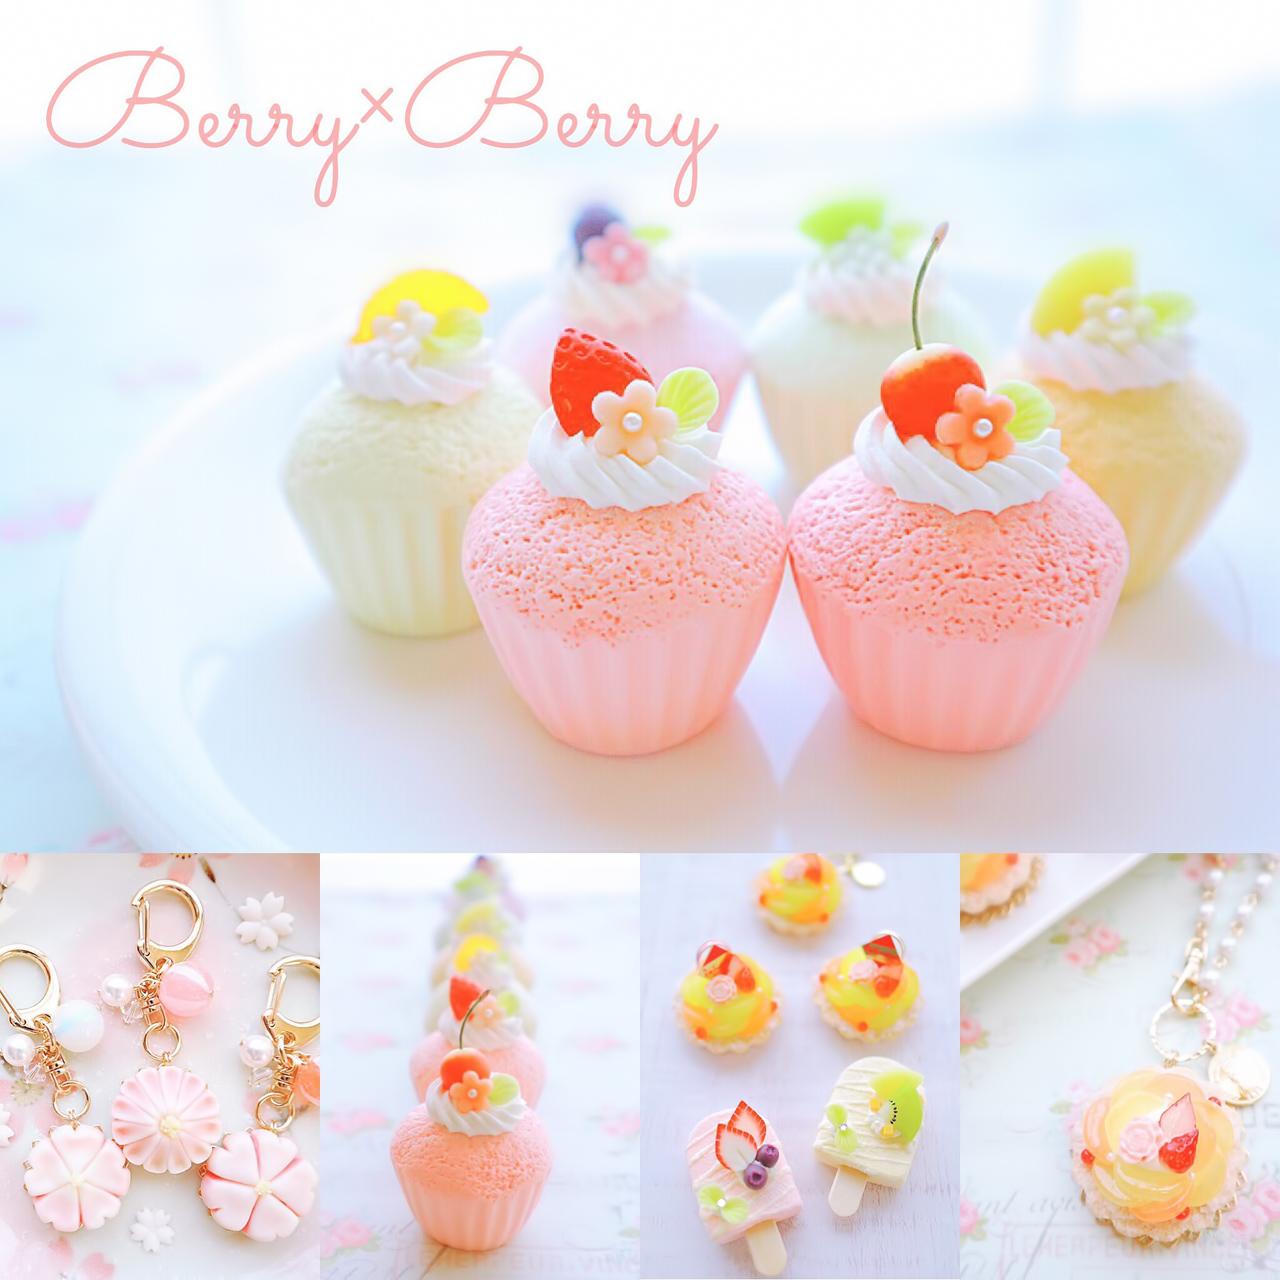 Berry×Berry - ベリー×ベリー